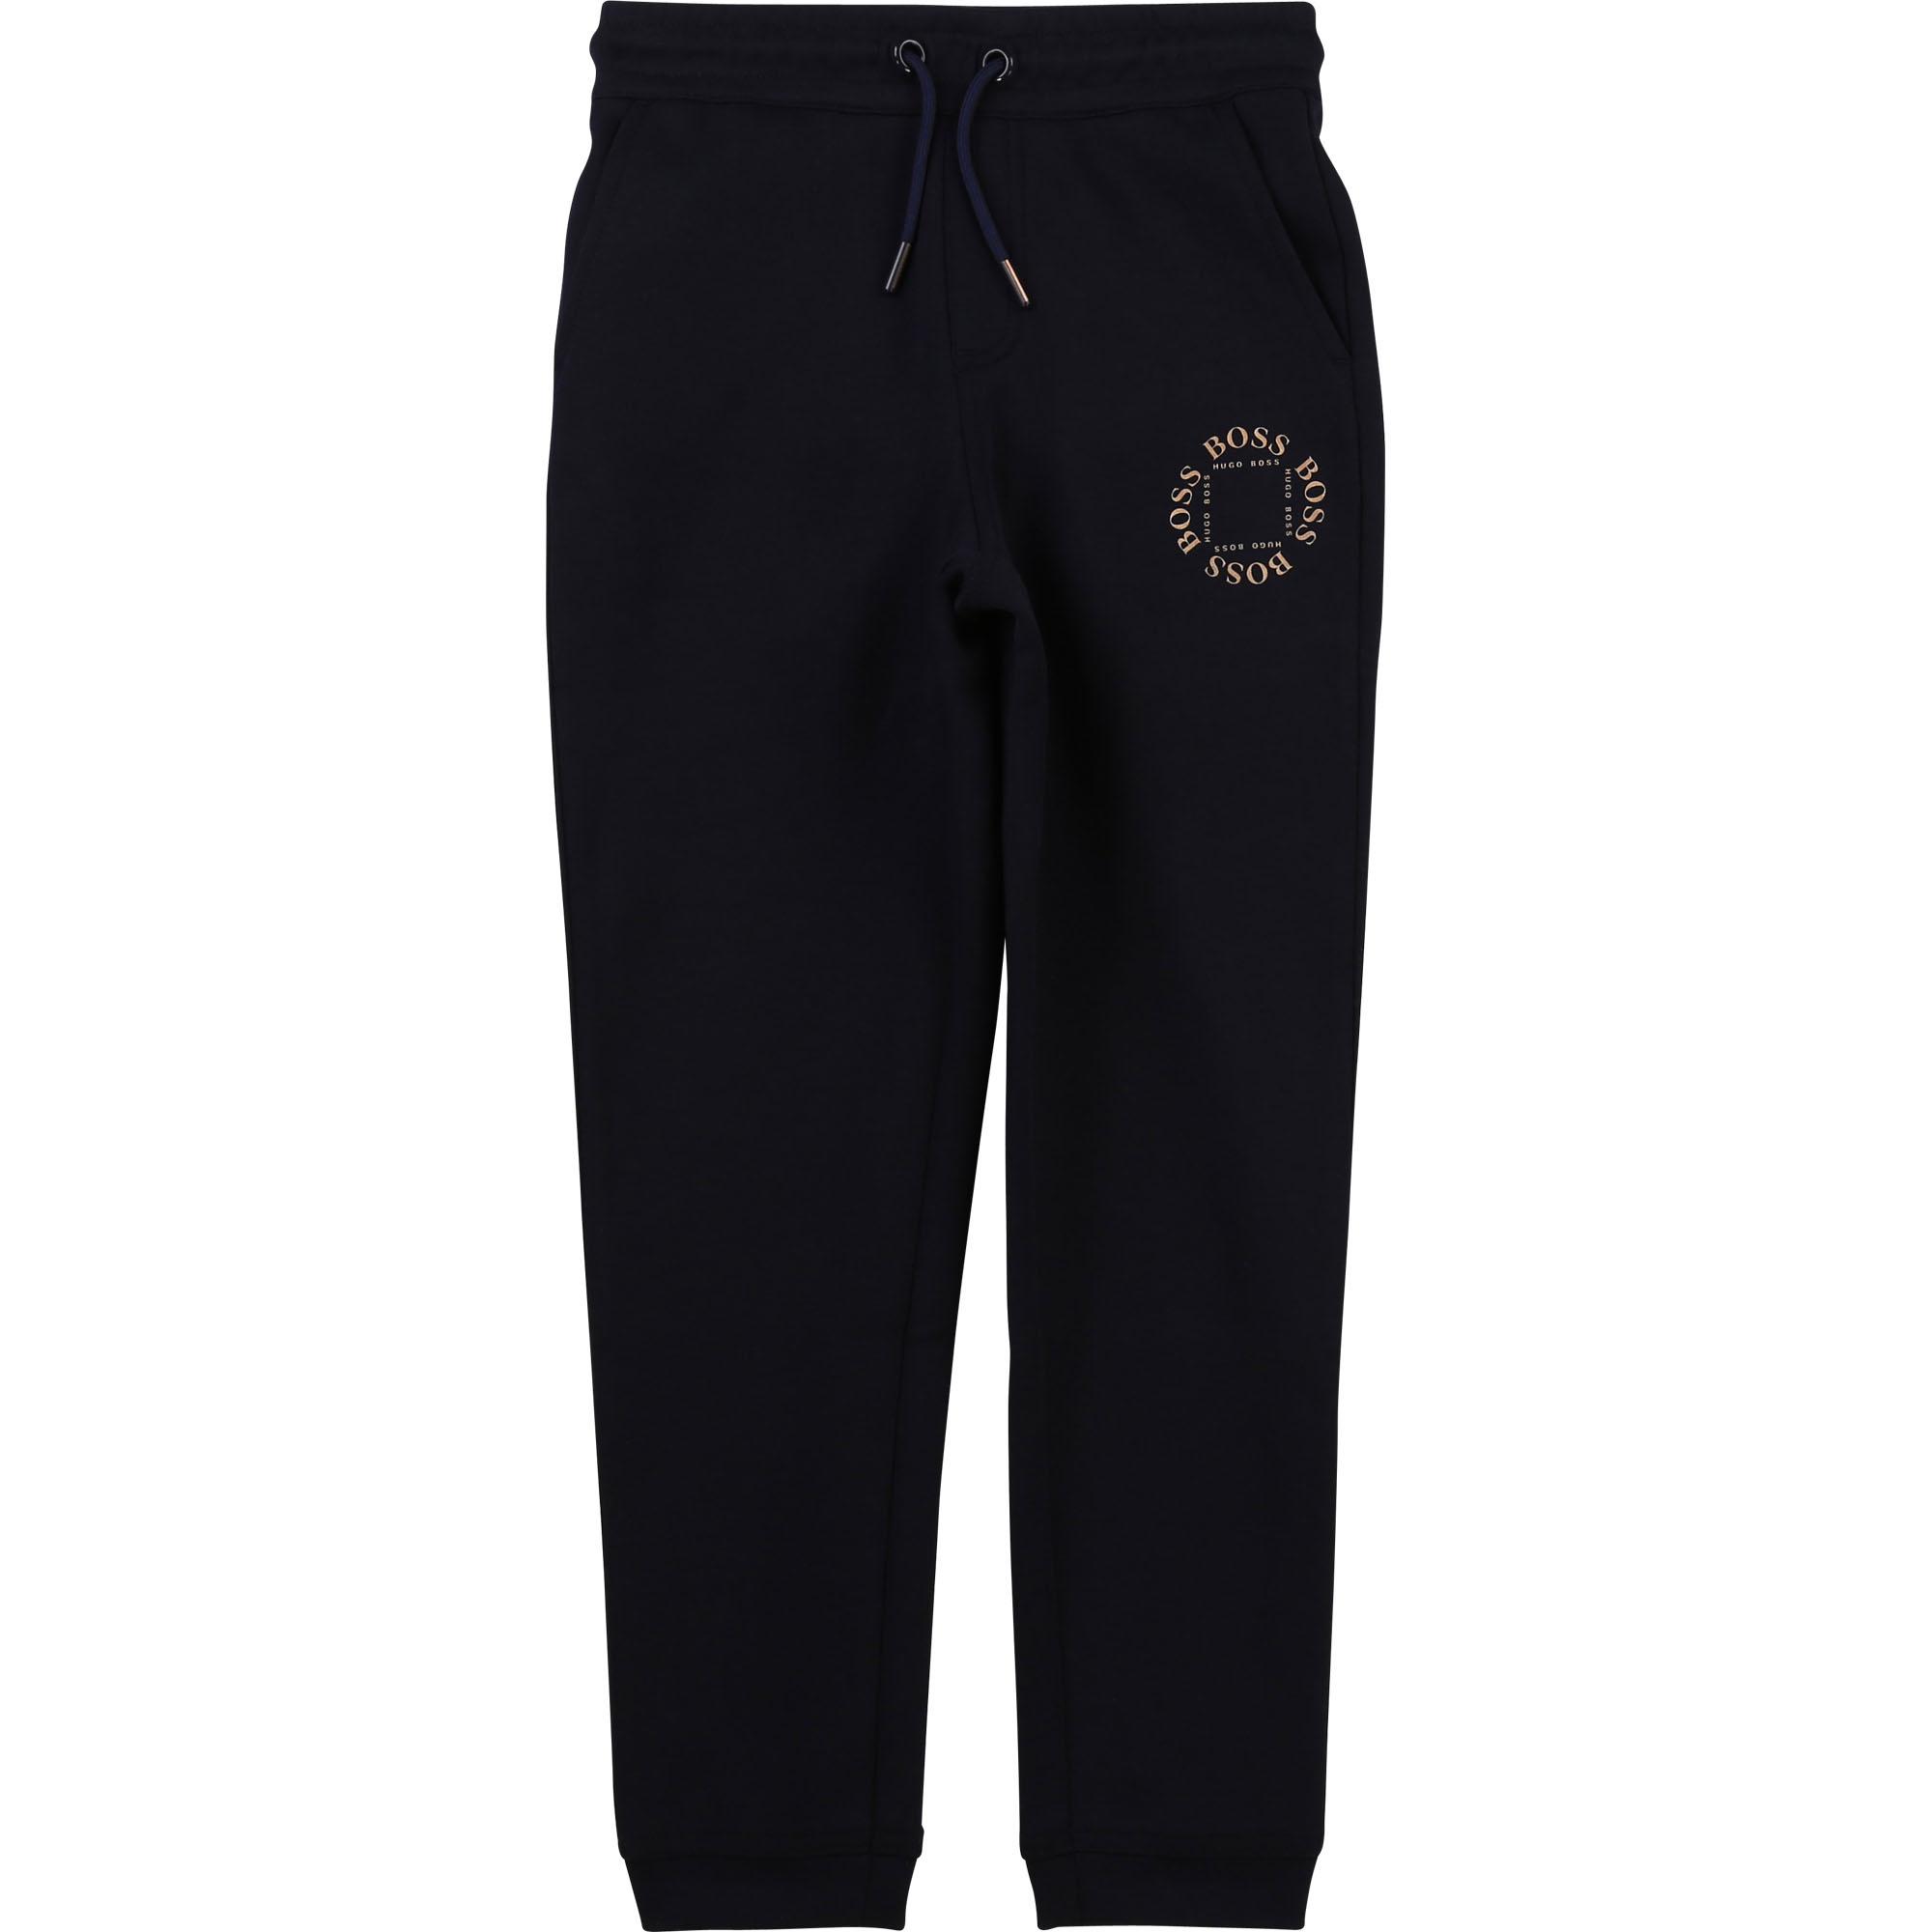 BOSS pantalon de jogging-1